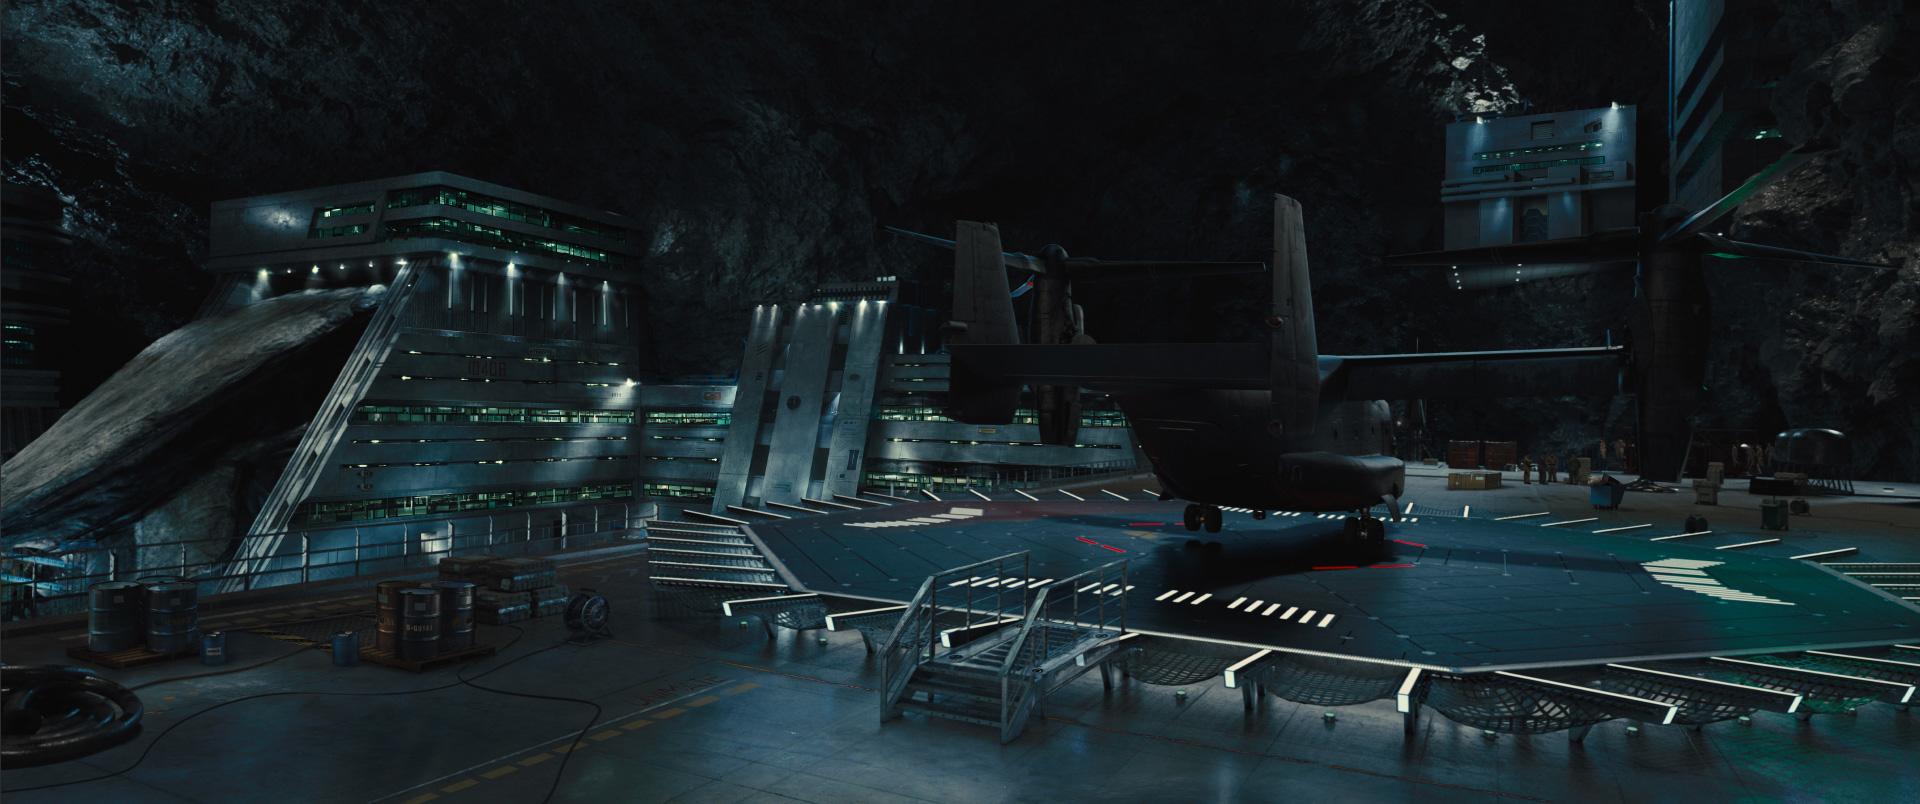 7. Godzilla_DMP_IgorStaritsin.jpg